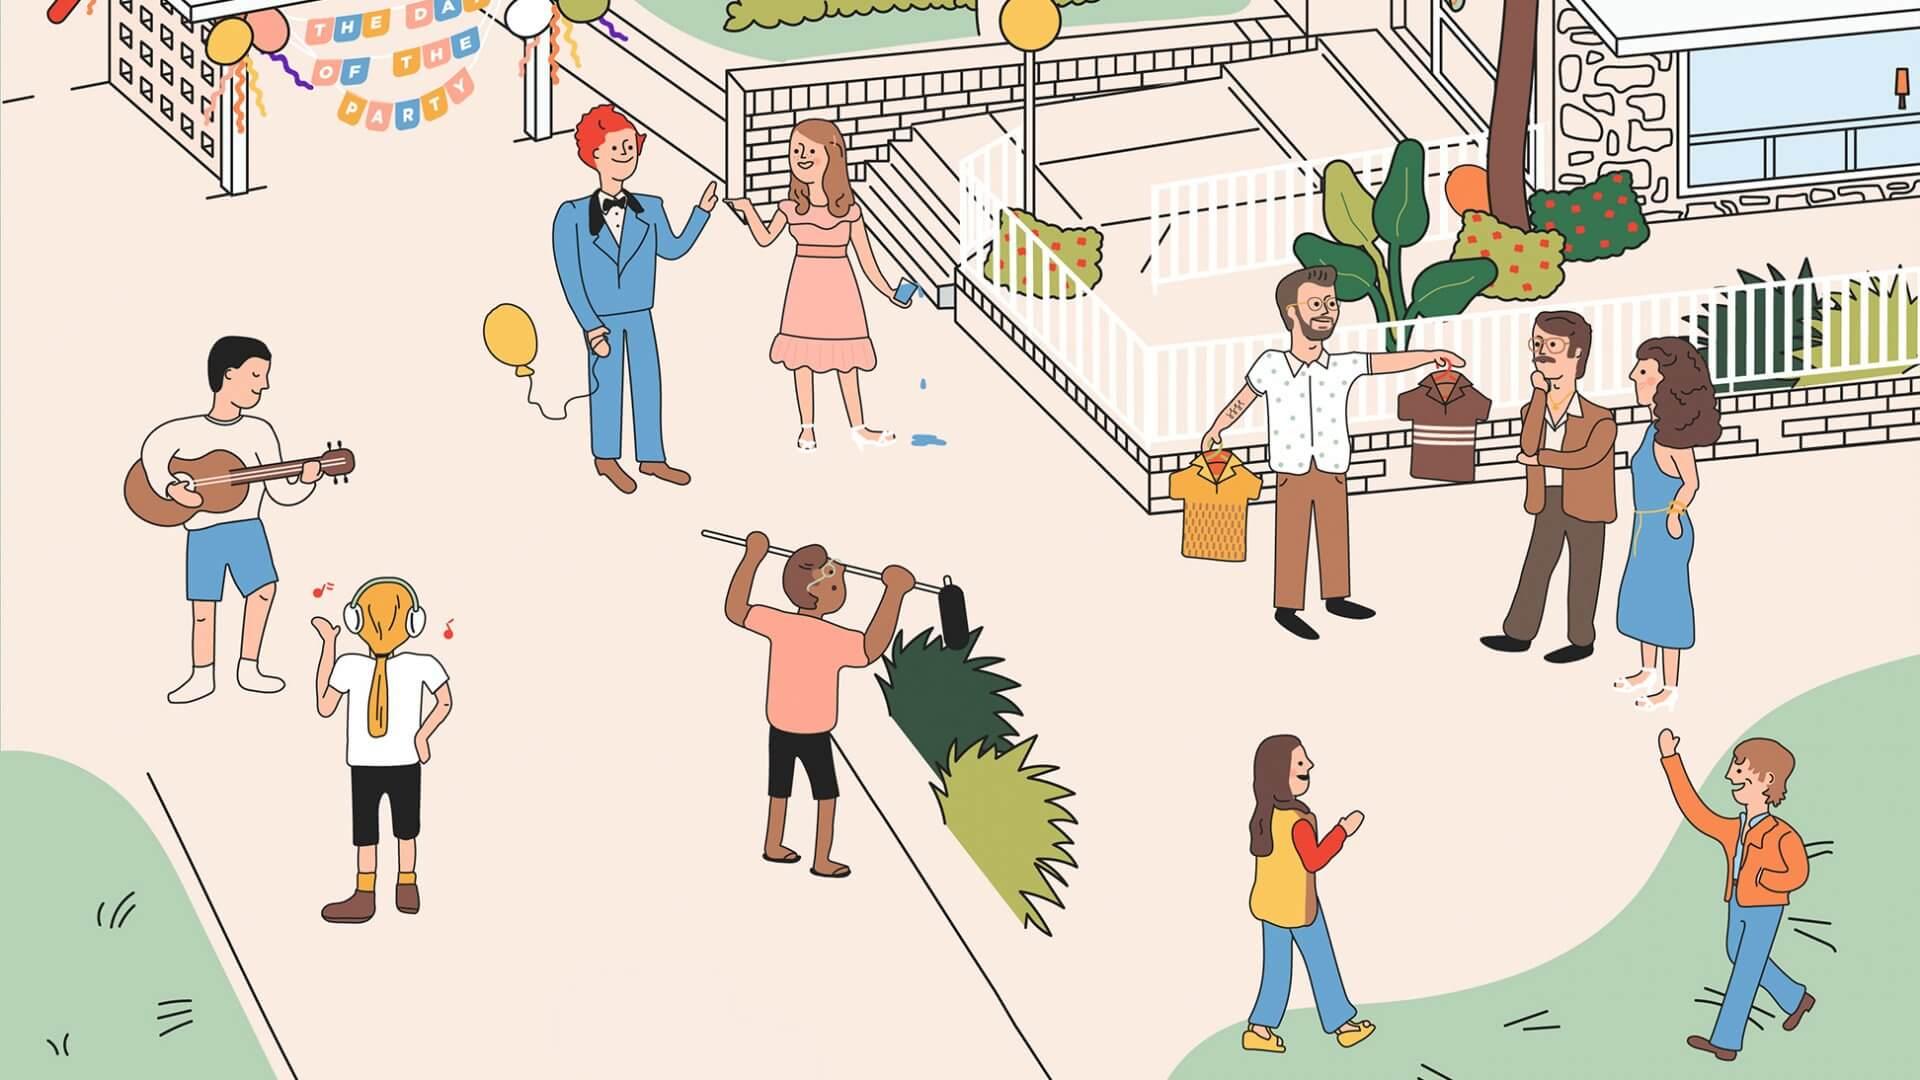 Windmill launches free immersive digital platform Girl Asleep: An Interactive Journey